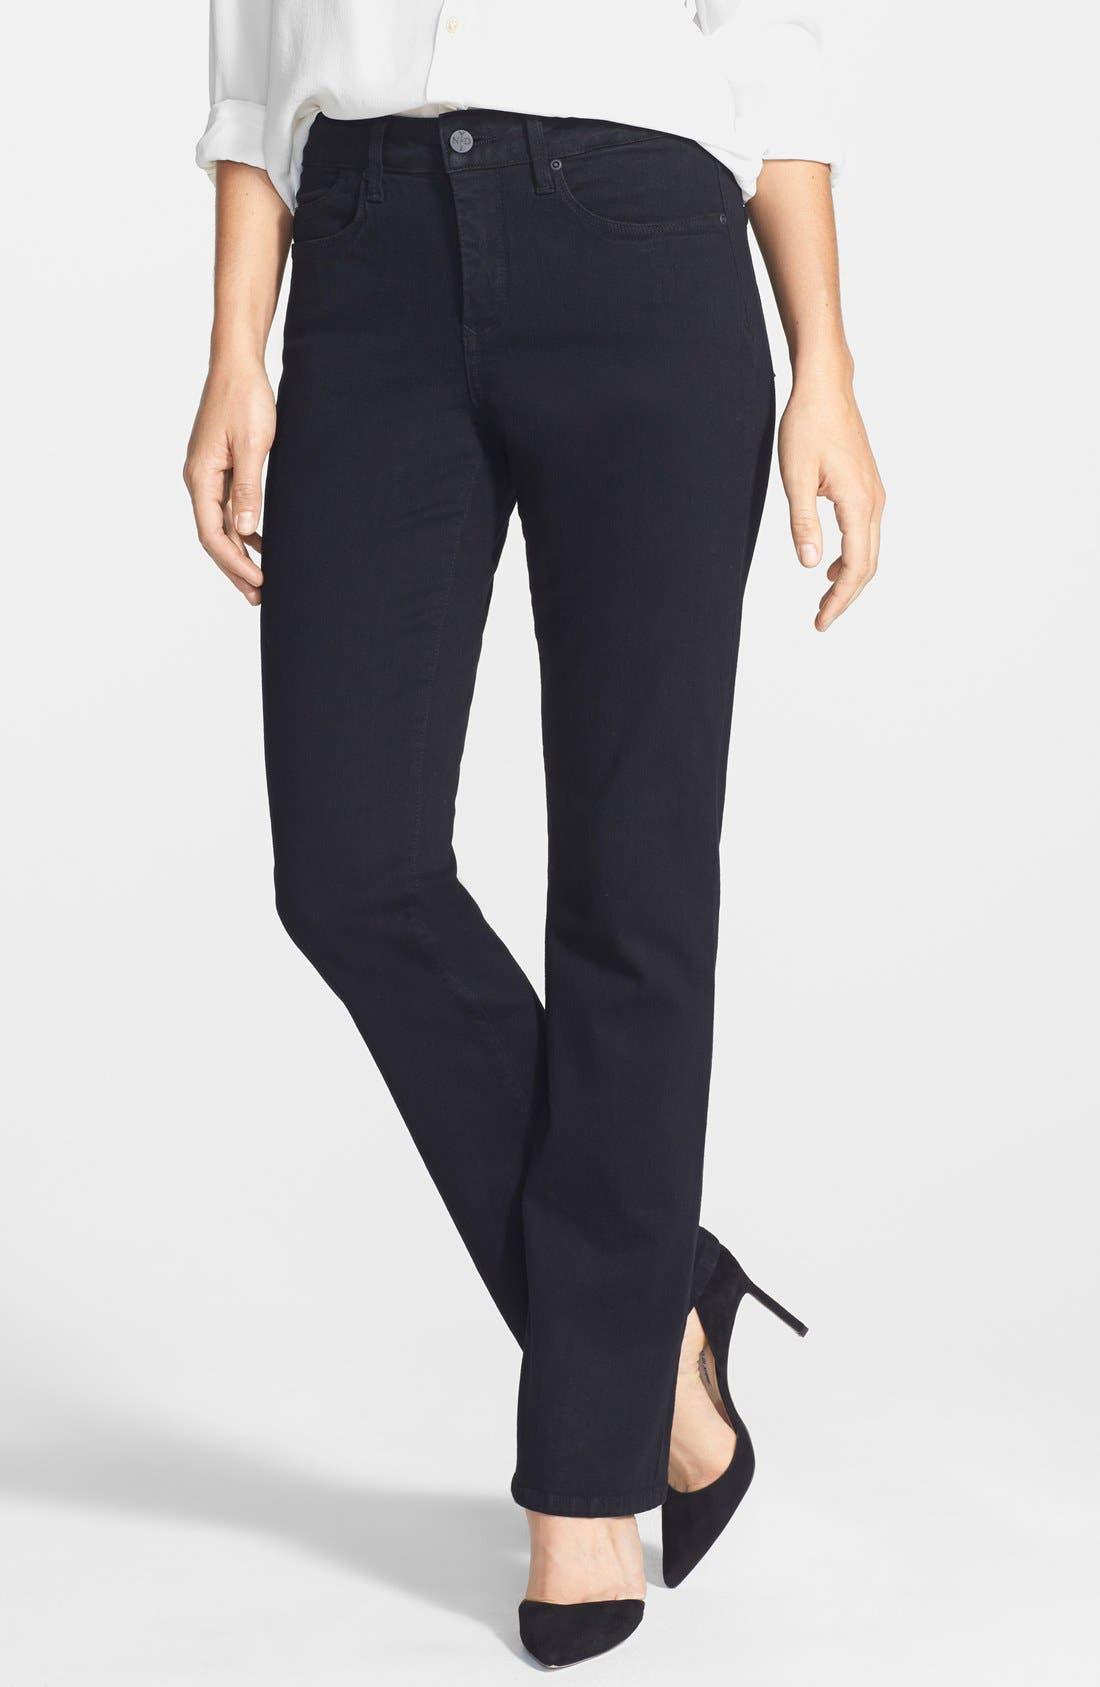 NYDJ, 'Billie' Stretch Mini Bootcut Jeans, Main thumbnail 1, color, BLACK